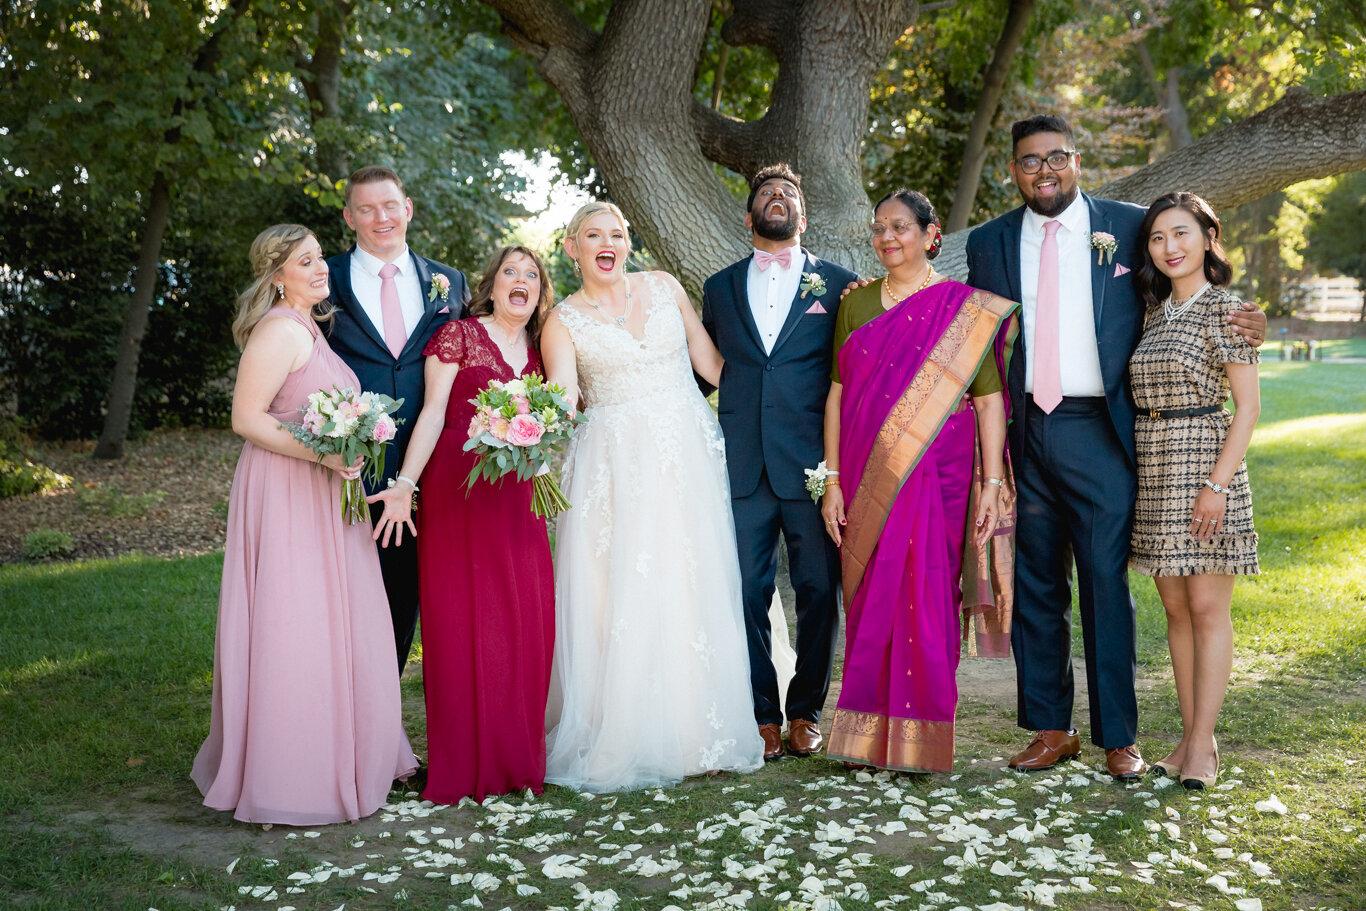 2019.08.24_Emily-Ashir-Wedding-at-the-Maples-6047.jpg